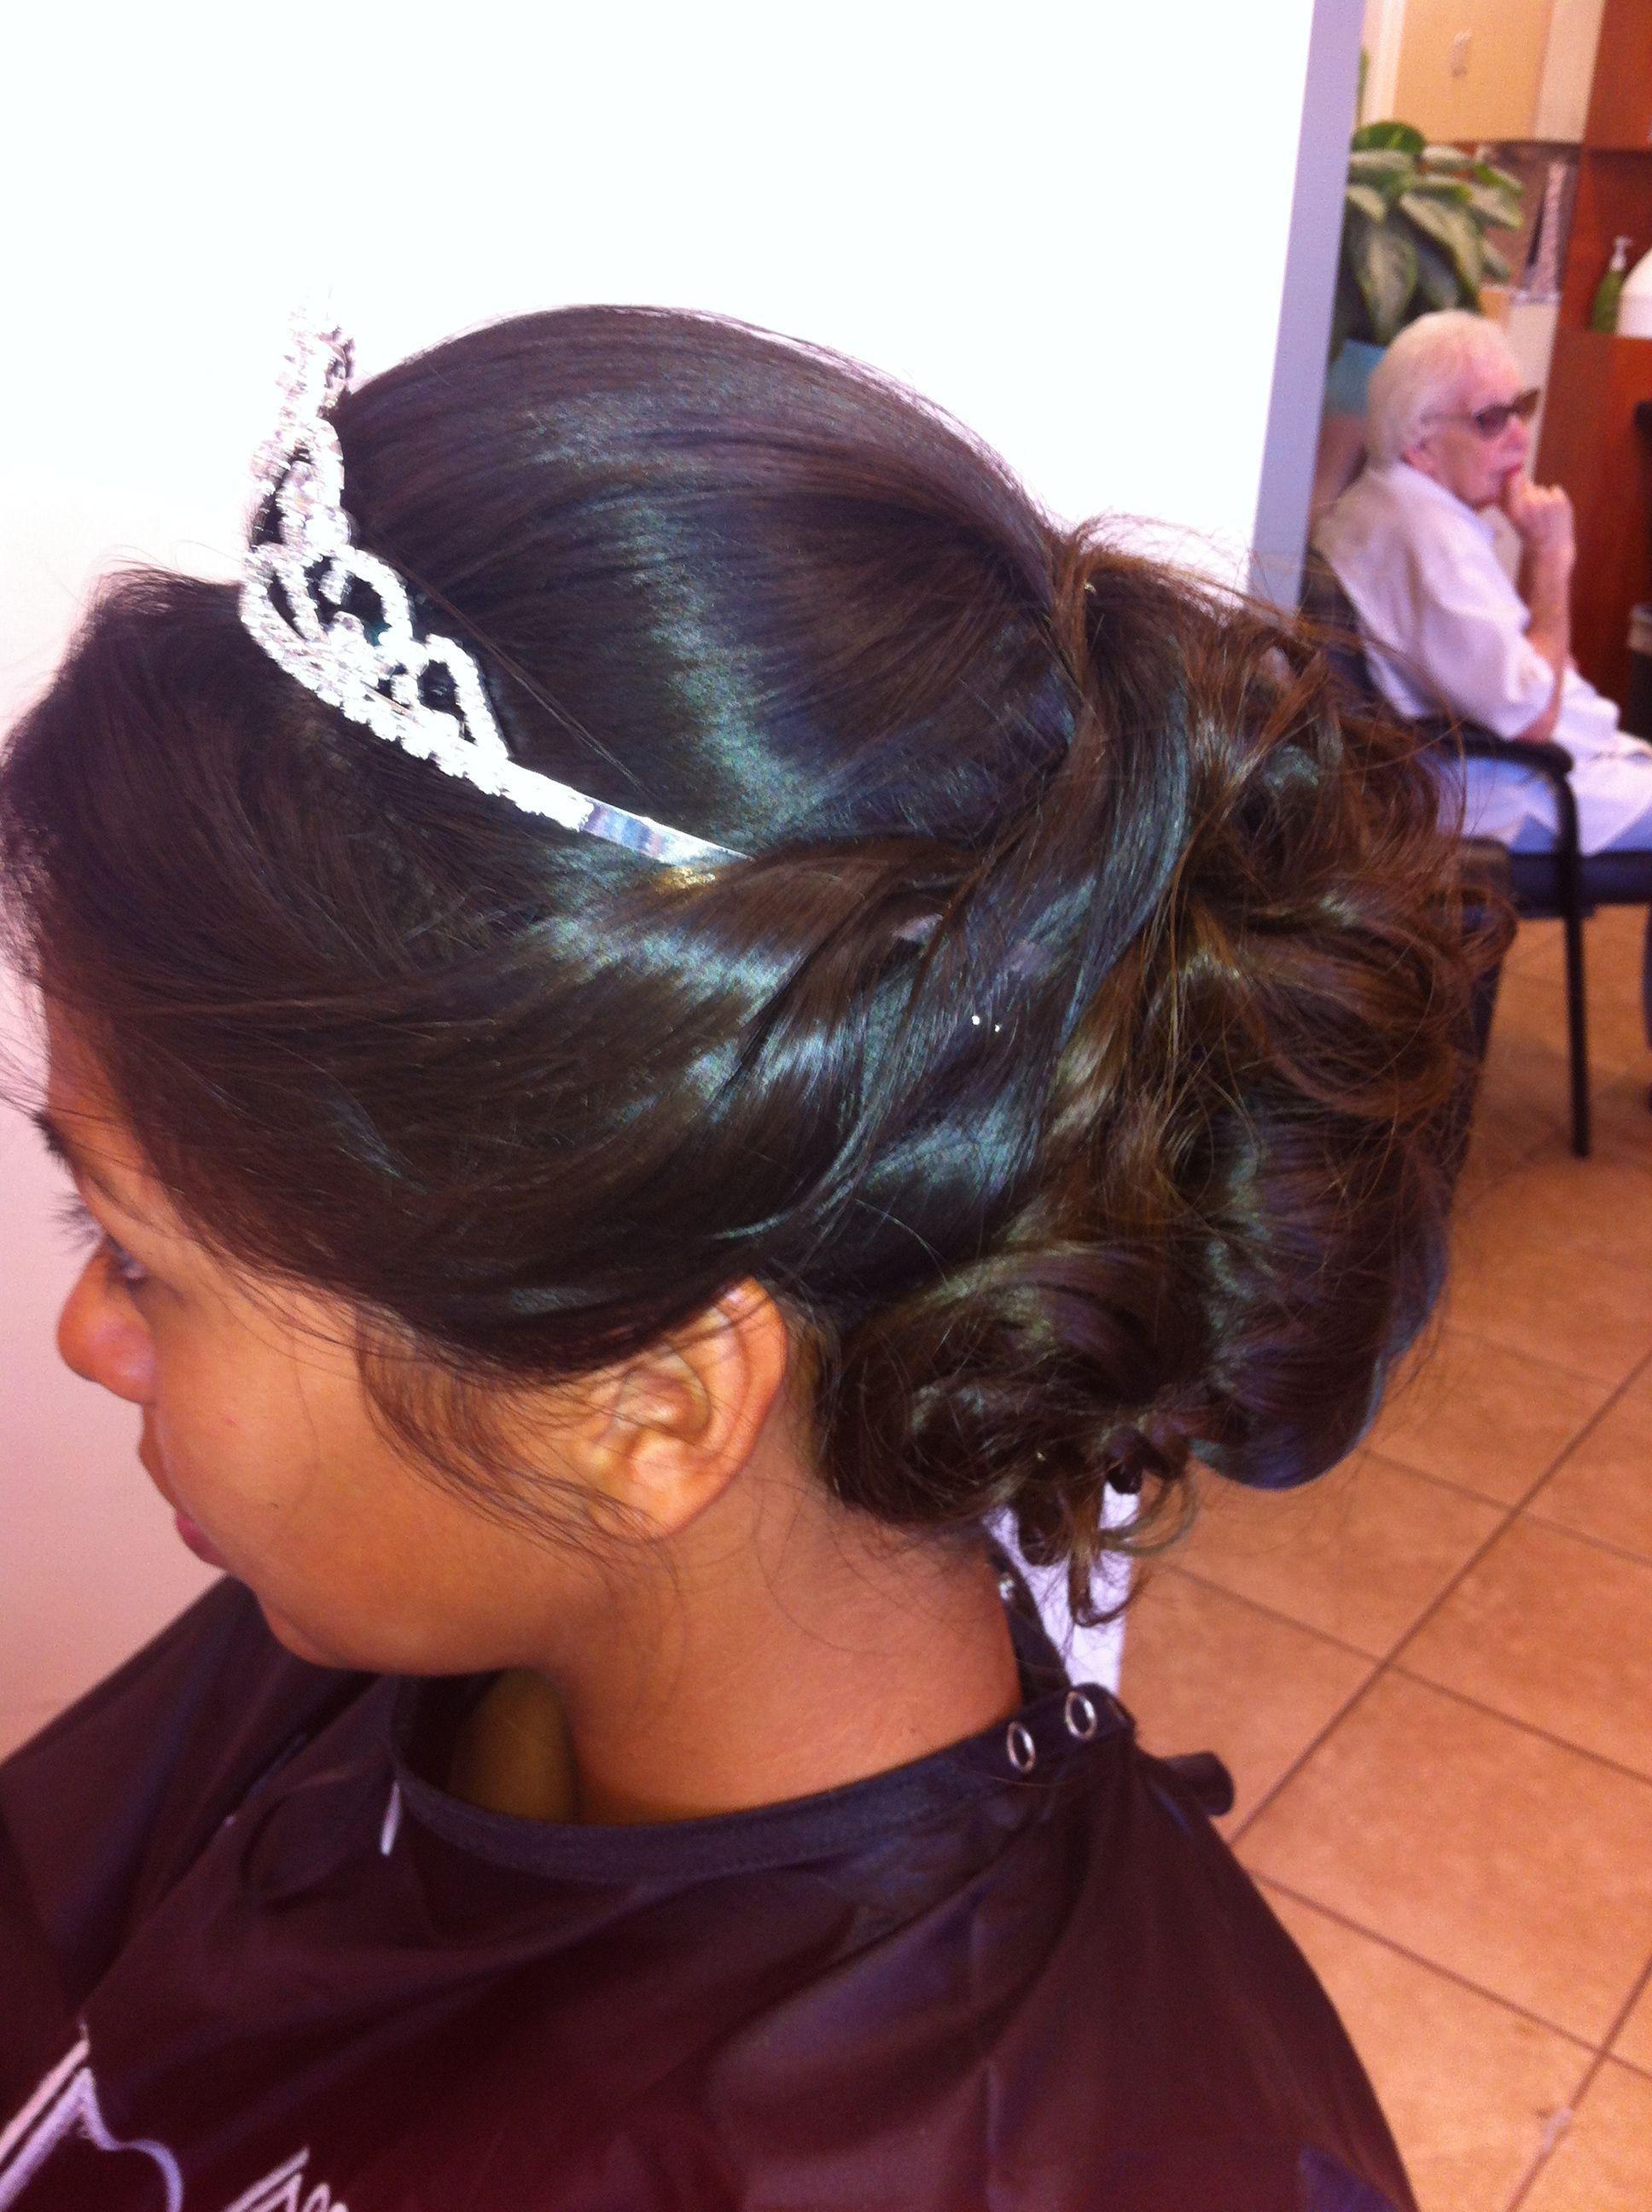 Beautiful Sweet 16 Updo Done By Kristi P Hairstyles Hair Styles Bridemaidshair Beautiful Sweet 16 Upd Bridemaids Hairstyles Sweet 16 Hairstyles Hair Styles